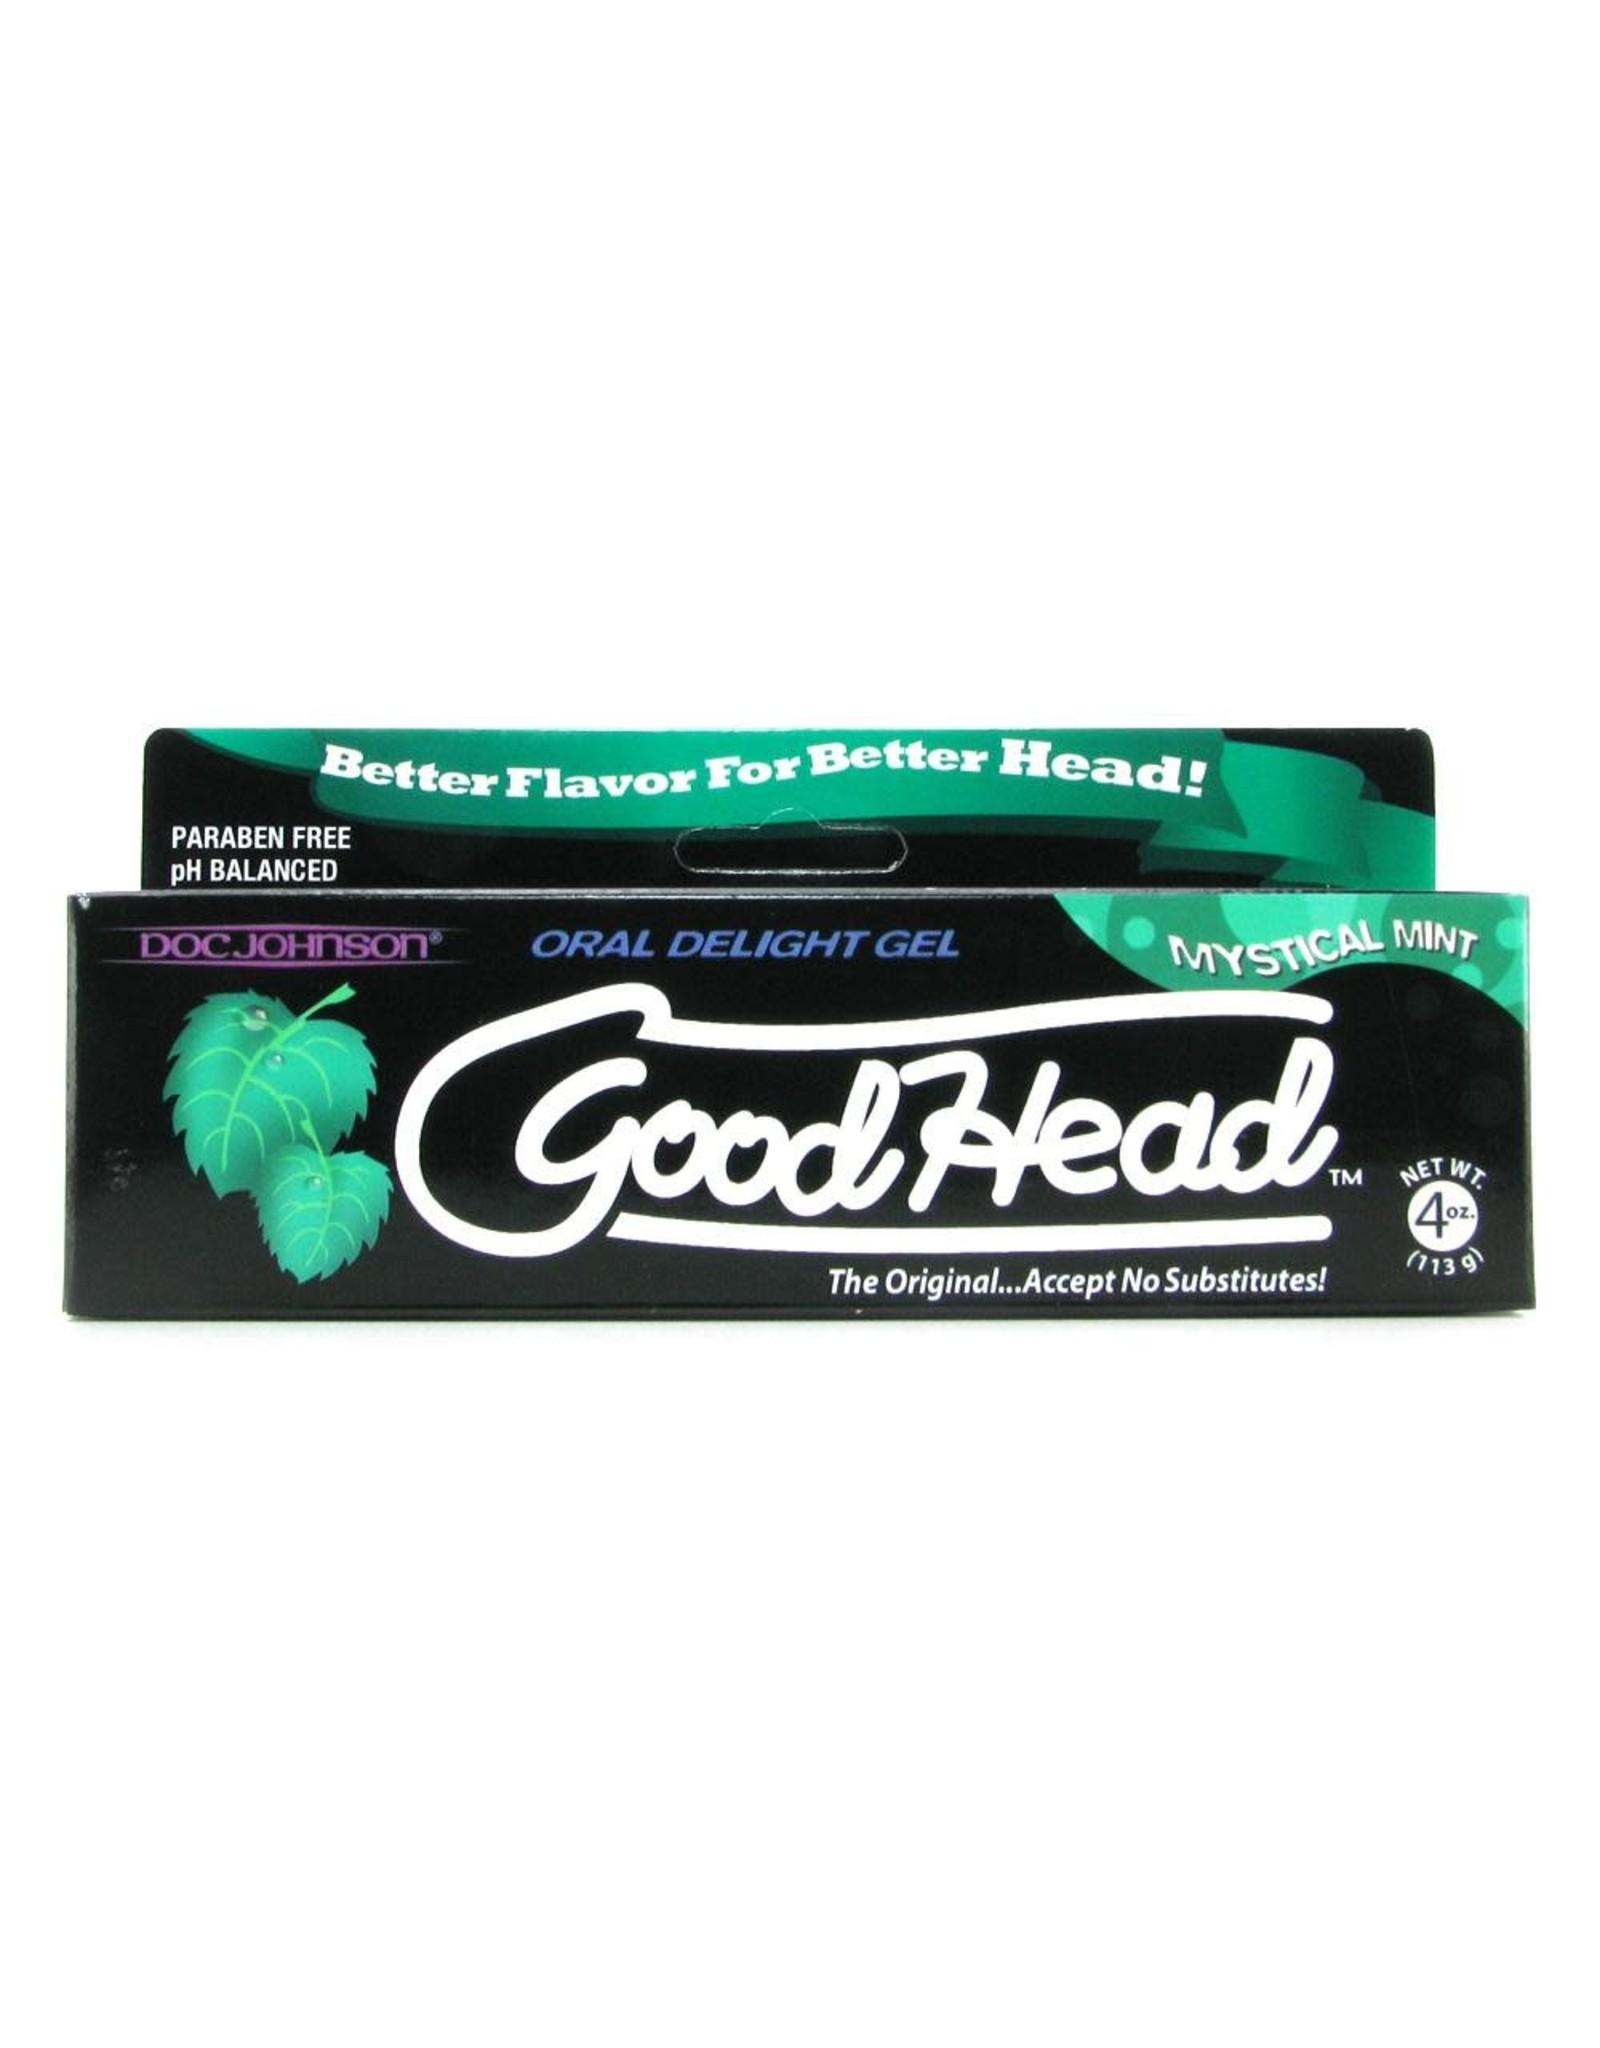 Doc Johnson Good Head - Oral Delight Gel -Mystical Mint - 4 oz